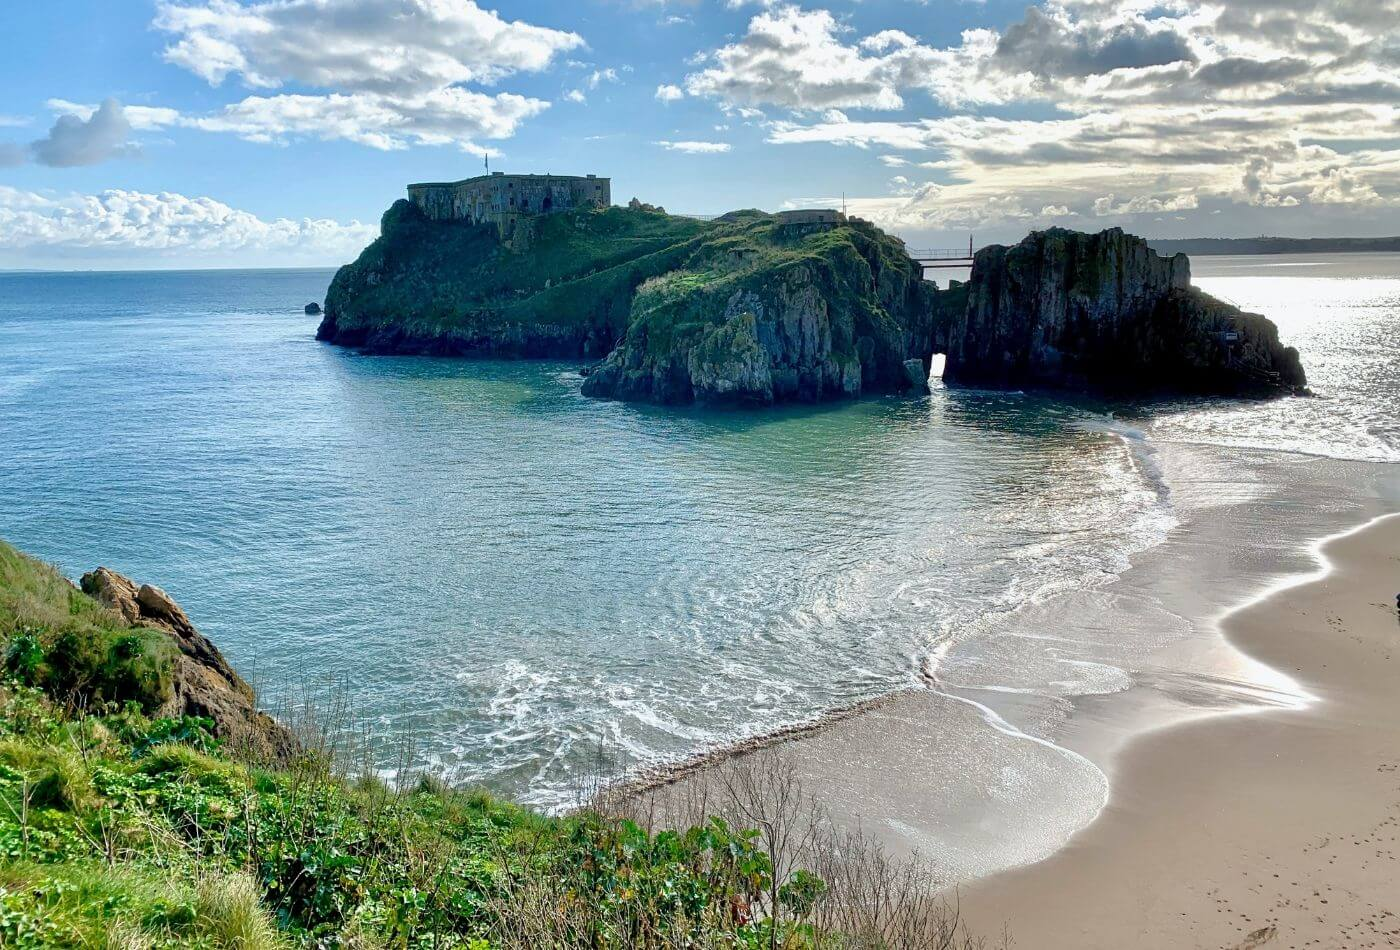 Pembrokeshire coastal scenery